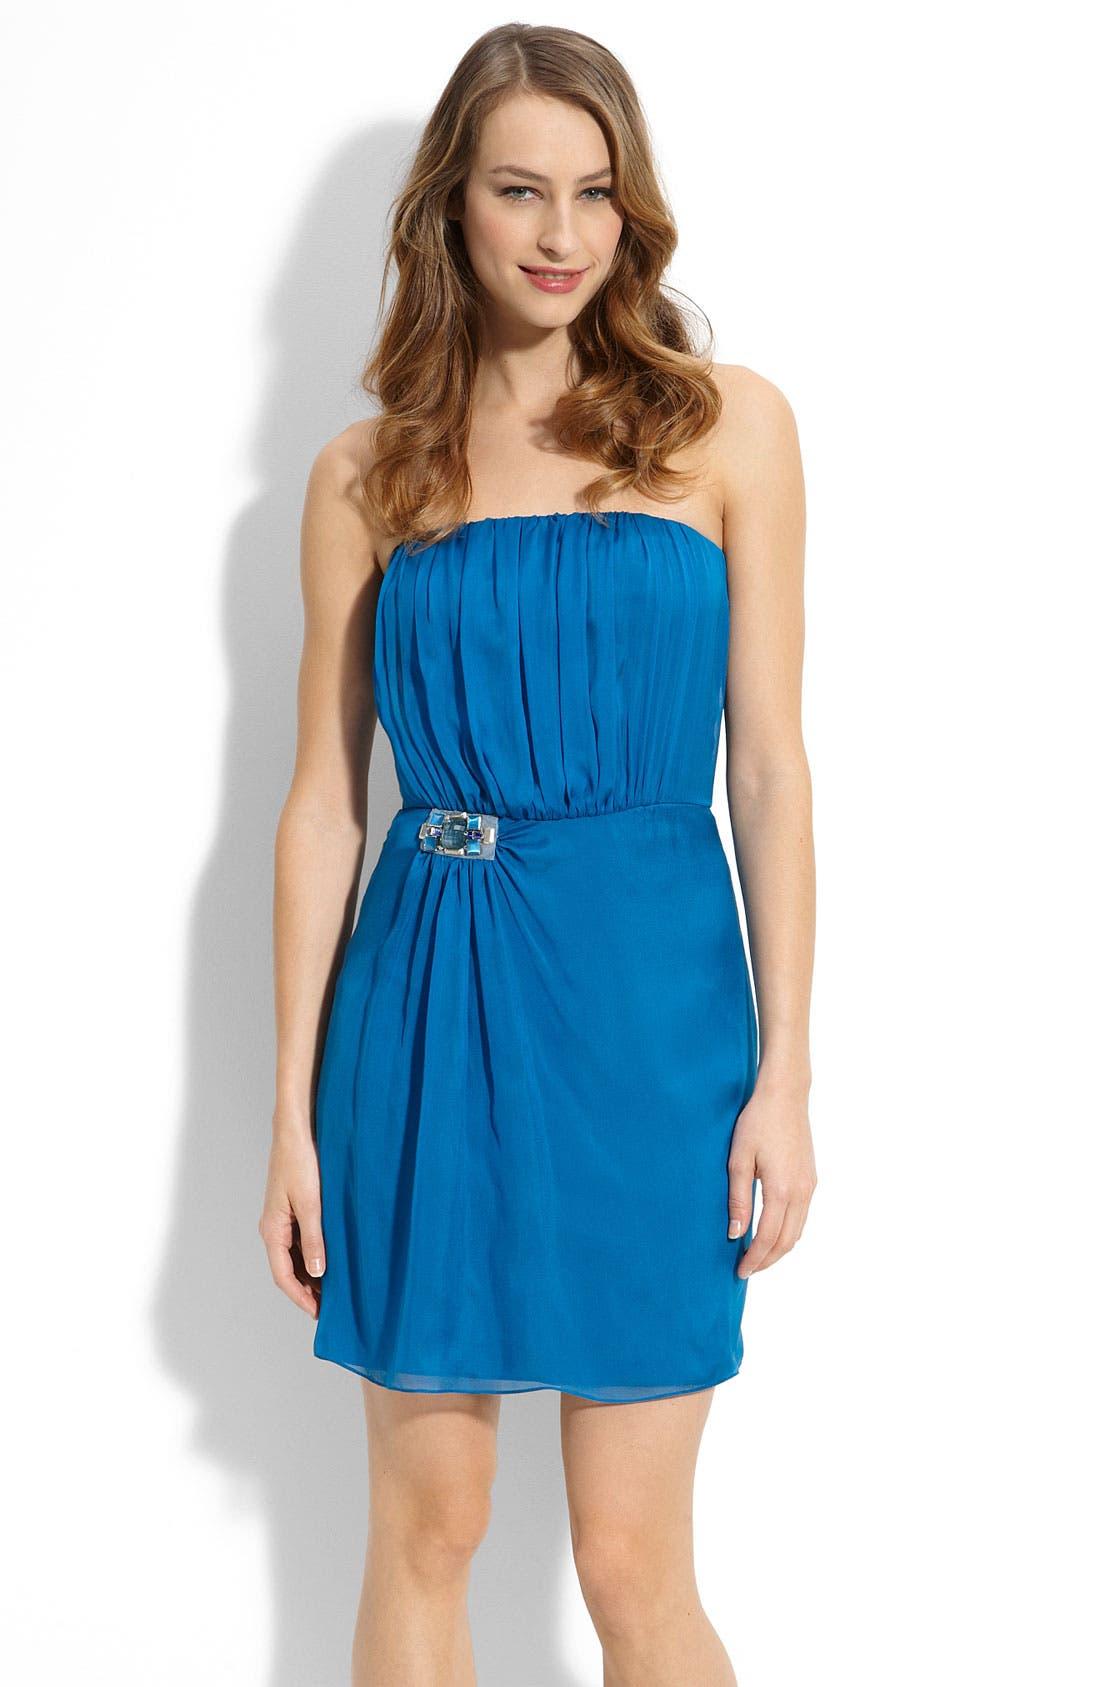 Alternate Image 1 Selected - MBN Jewel Waist Strapless Chiffon Dress